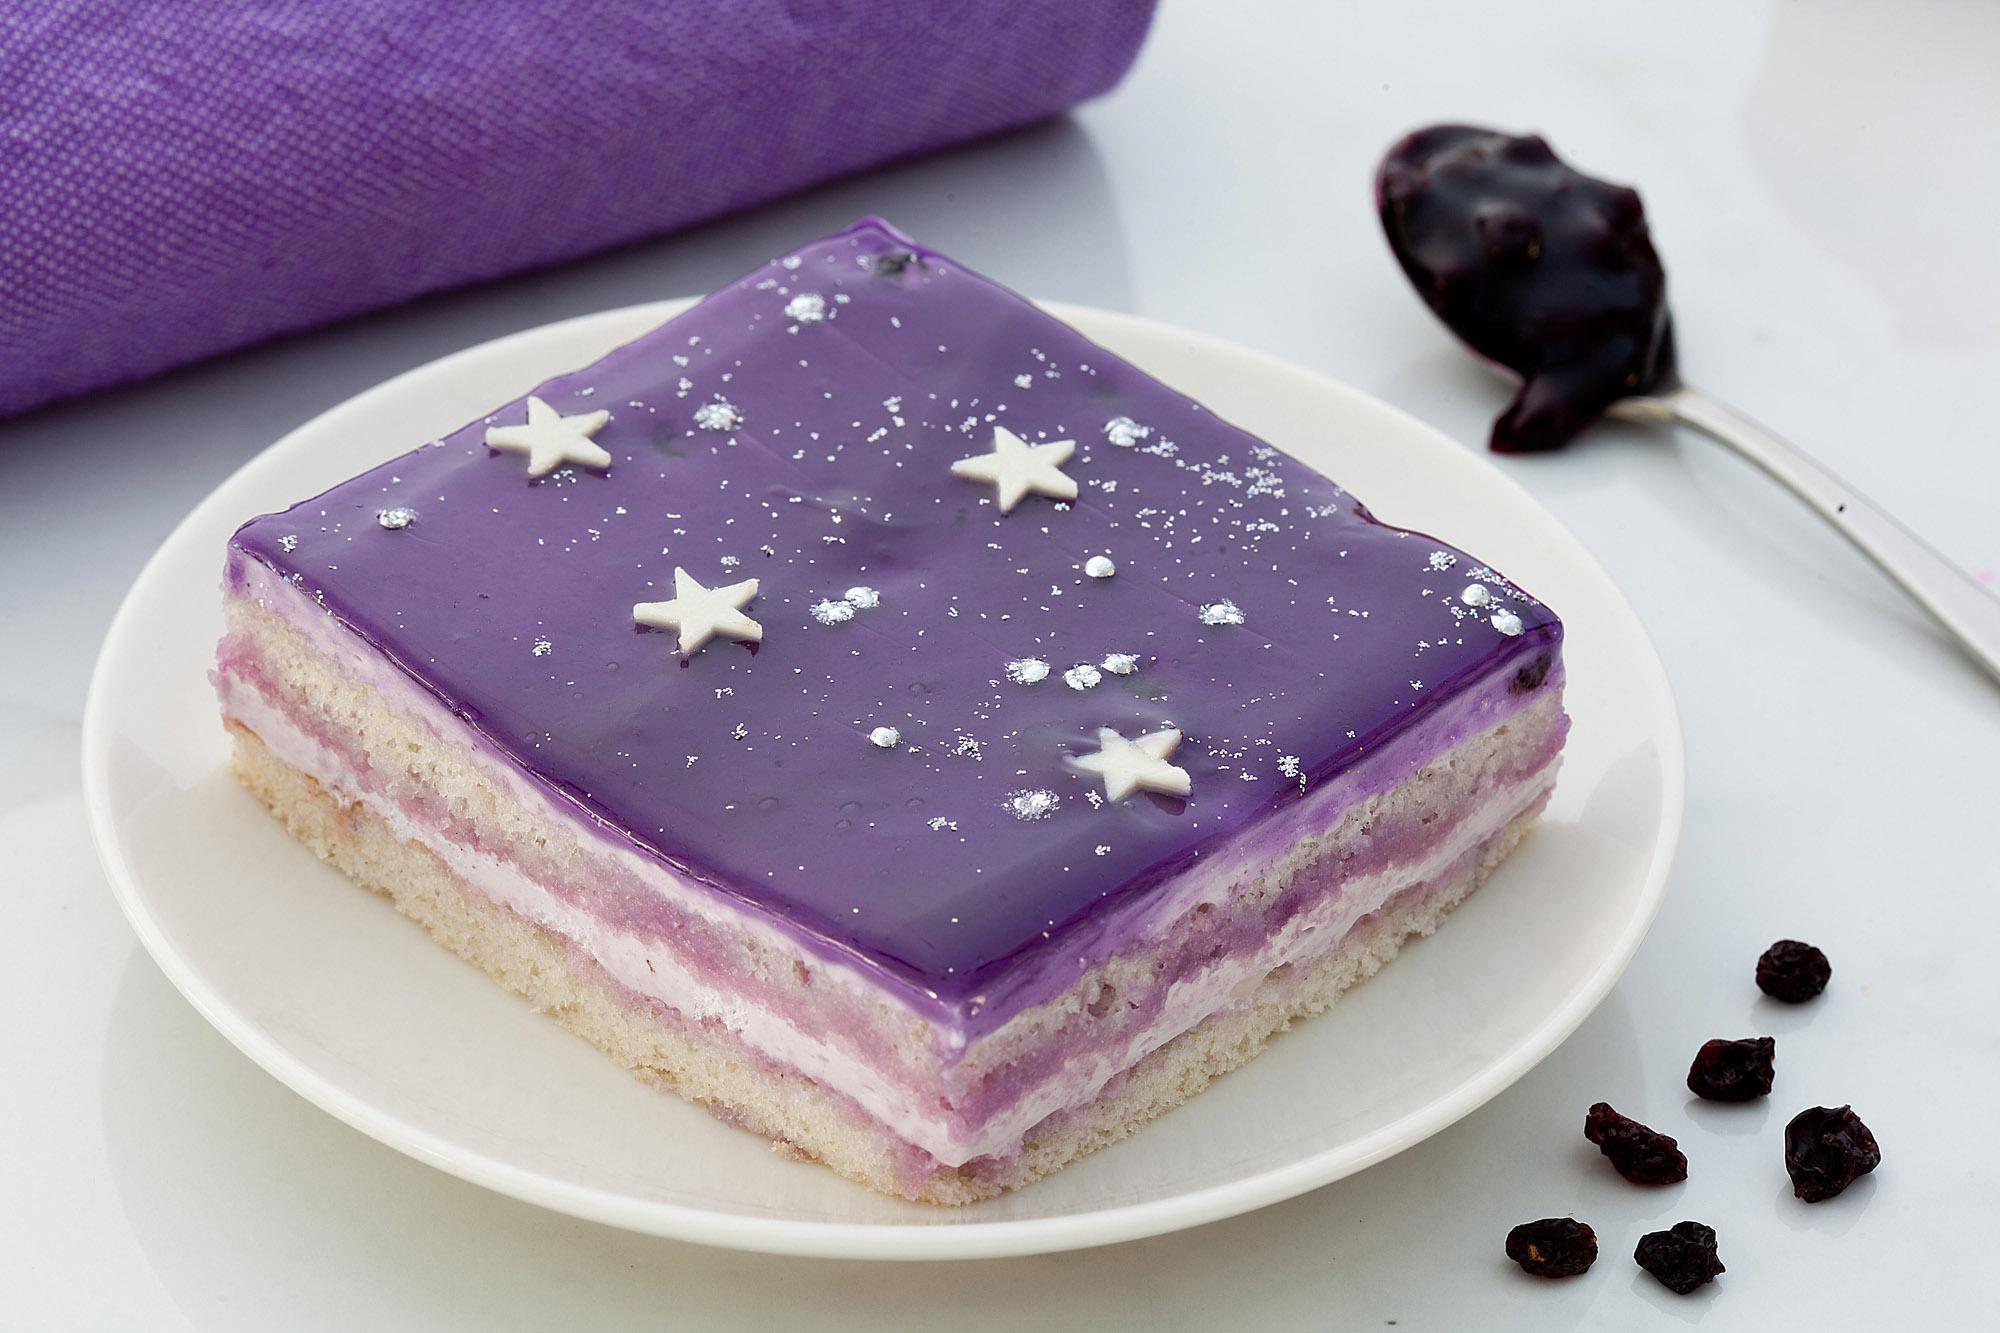 _18FMIMG_4266_Blueberry Galaxy Pastry.JPG